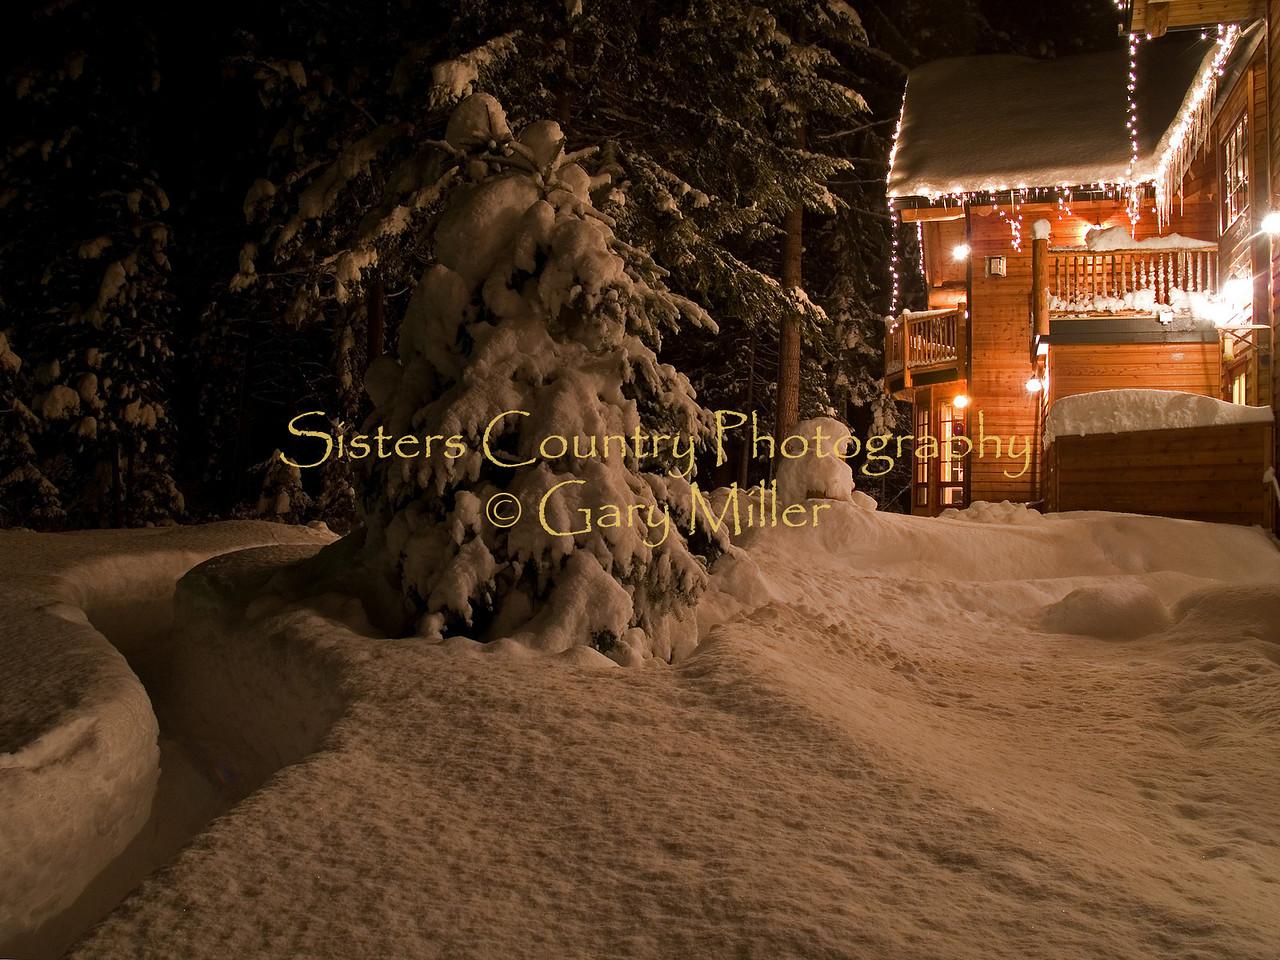 Winter Images - Gary Miller